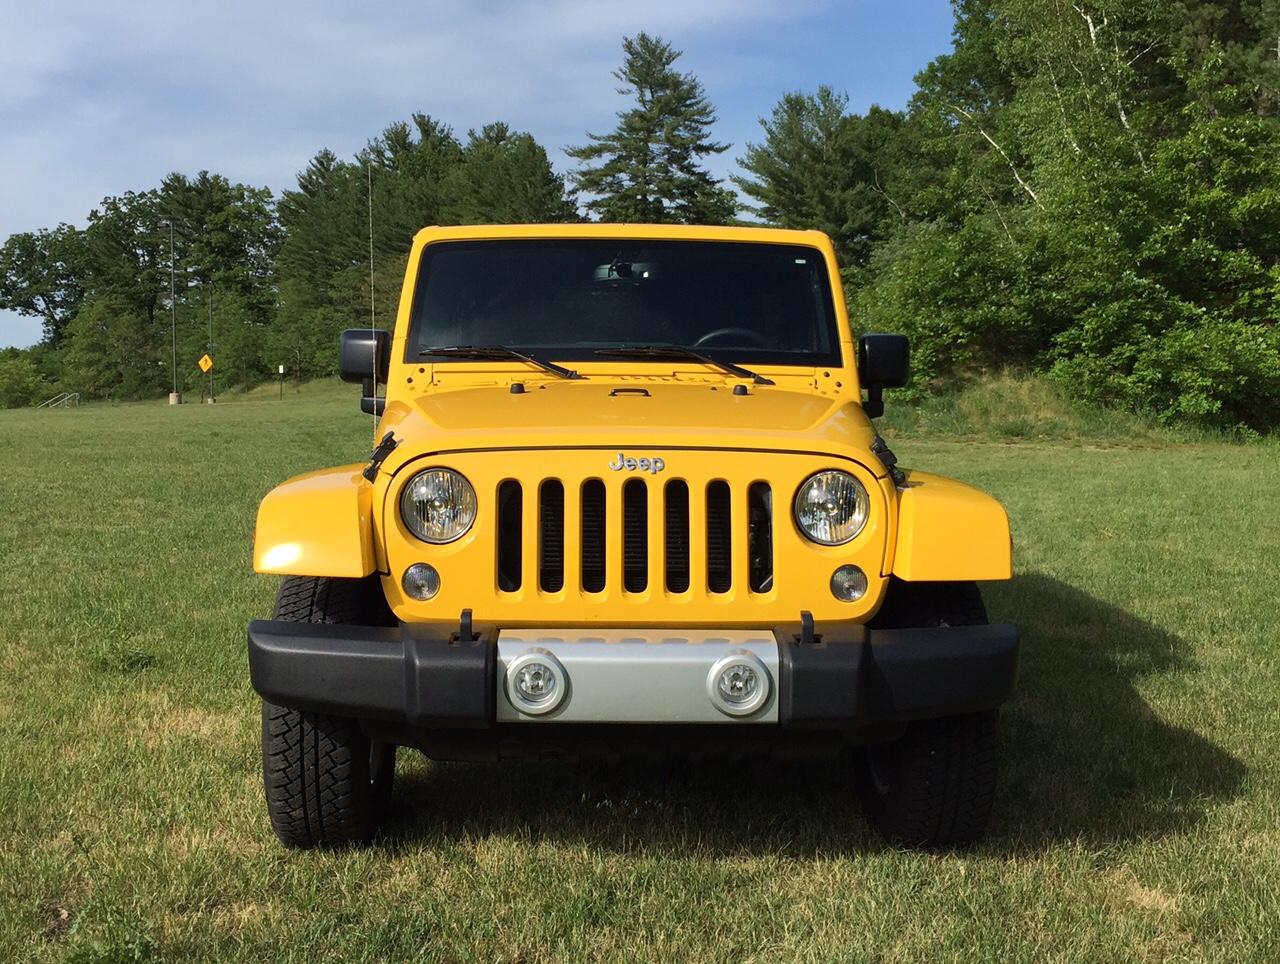 2015 Jeep Wrangler Unlimited Sahara 4x4 Front